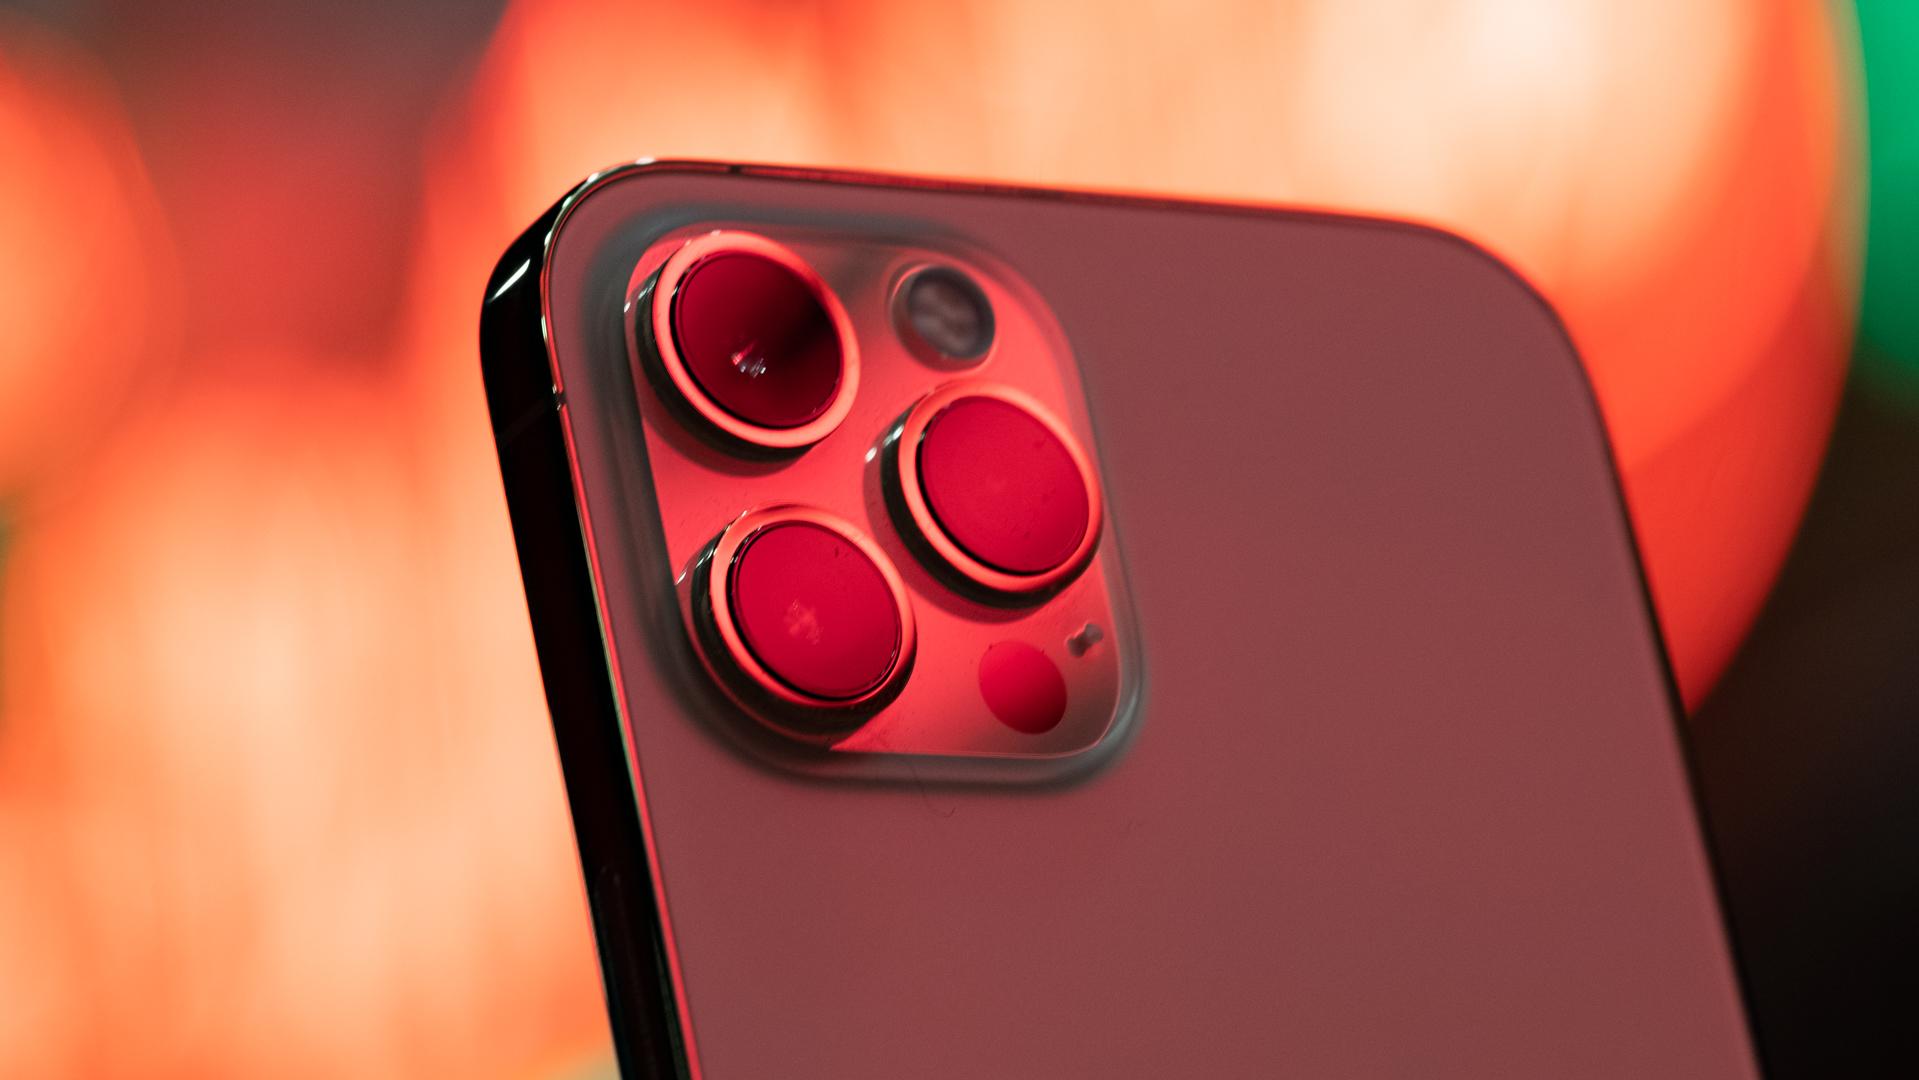 iPhone 12 Pro Max neon camera macro 3